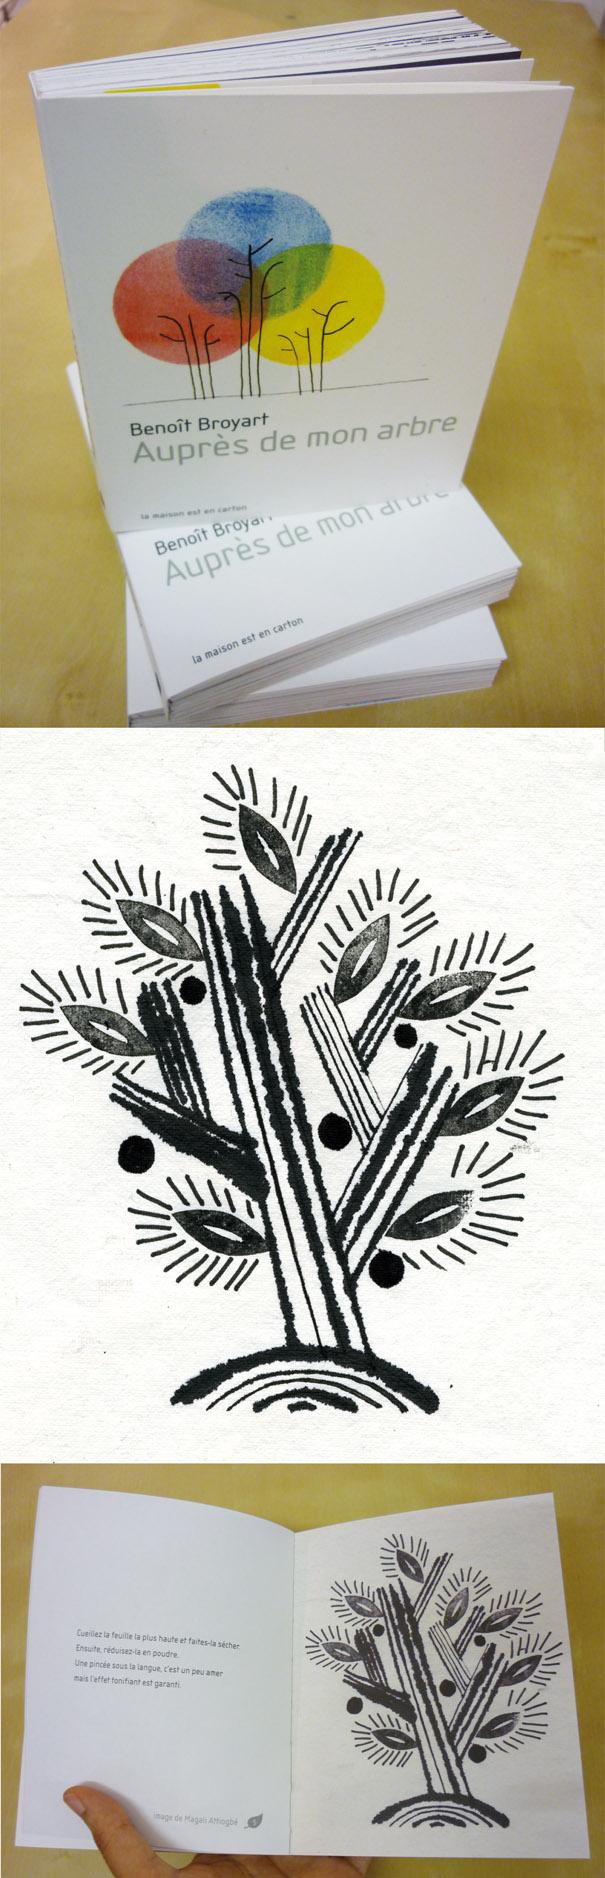 arbre_maison_carton